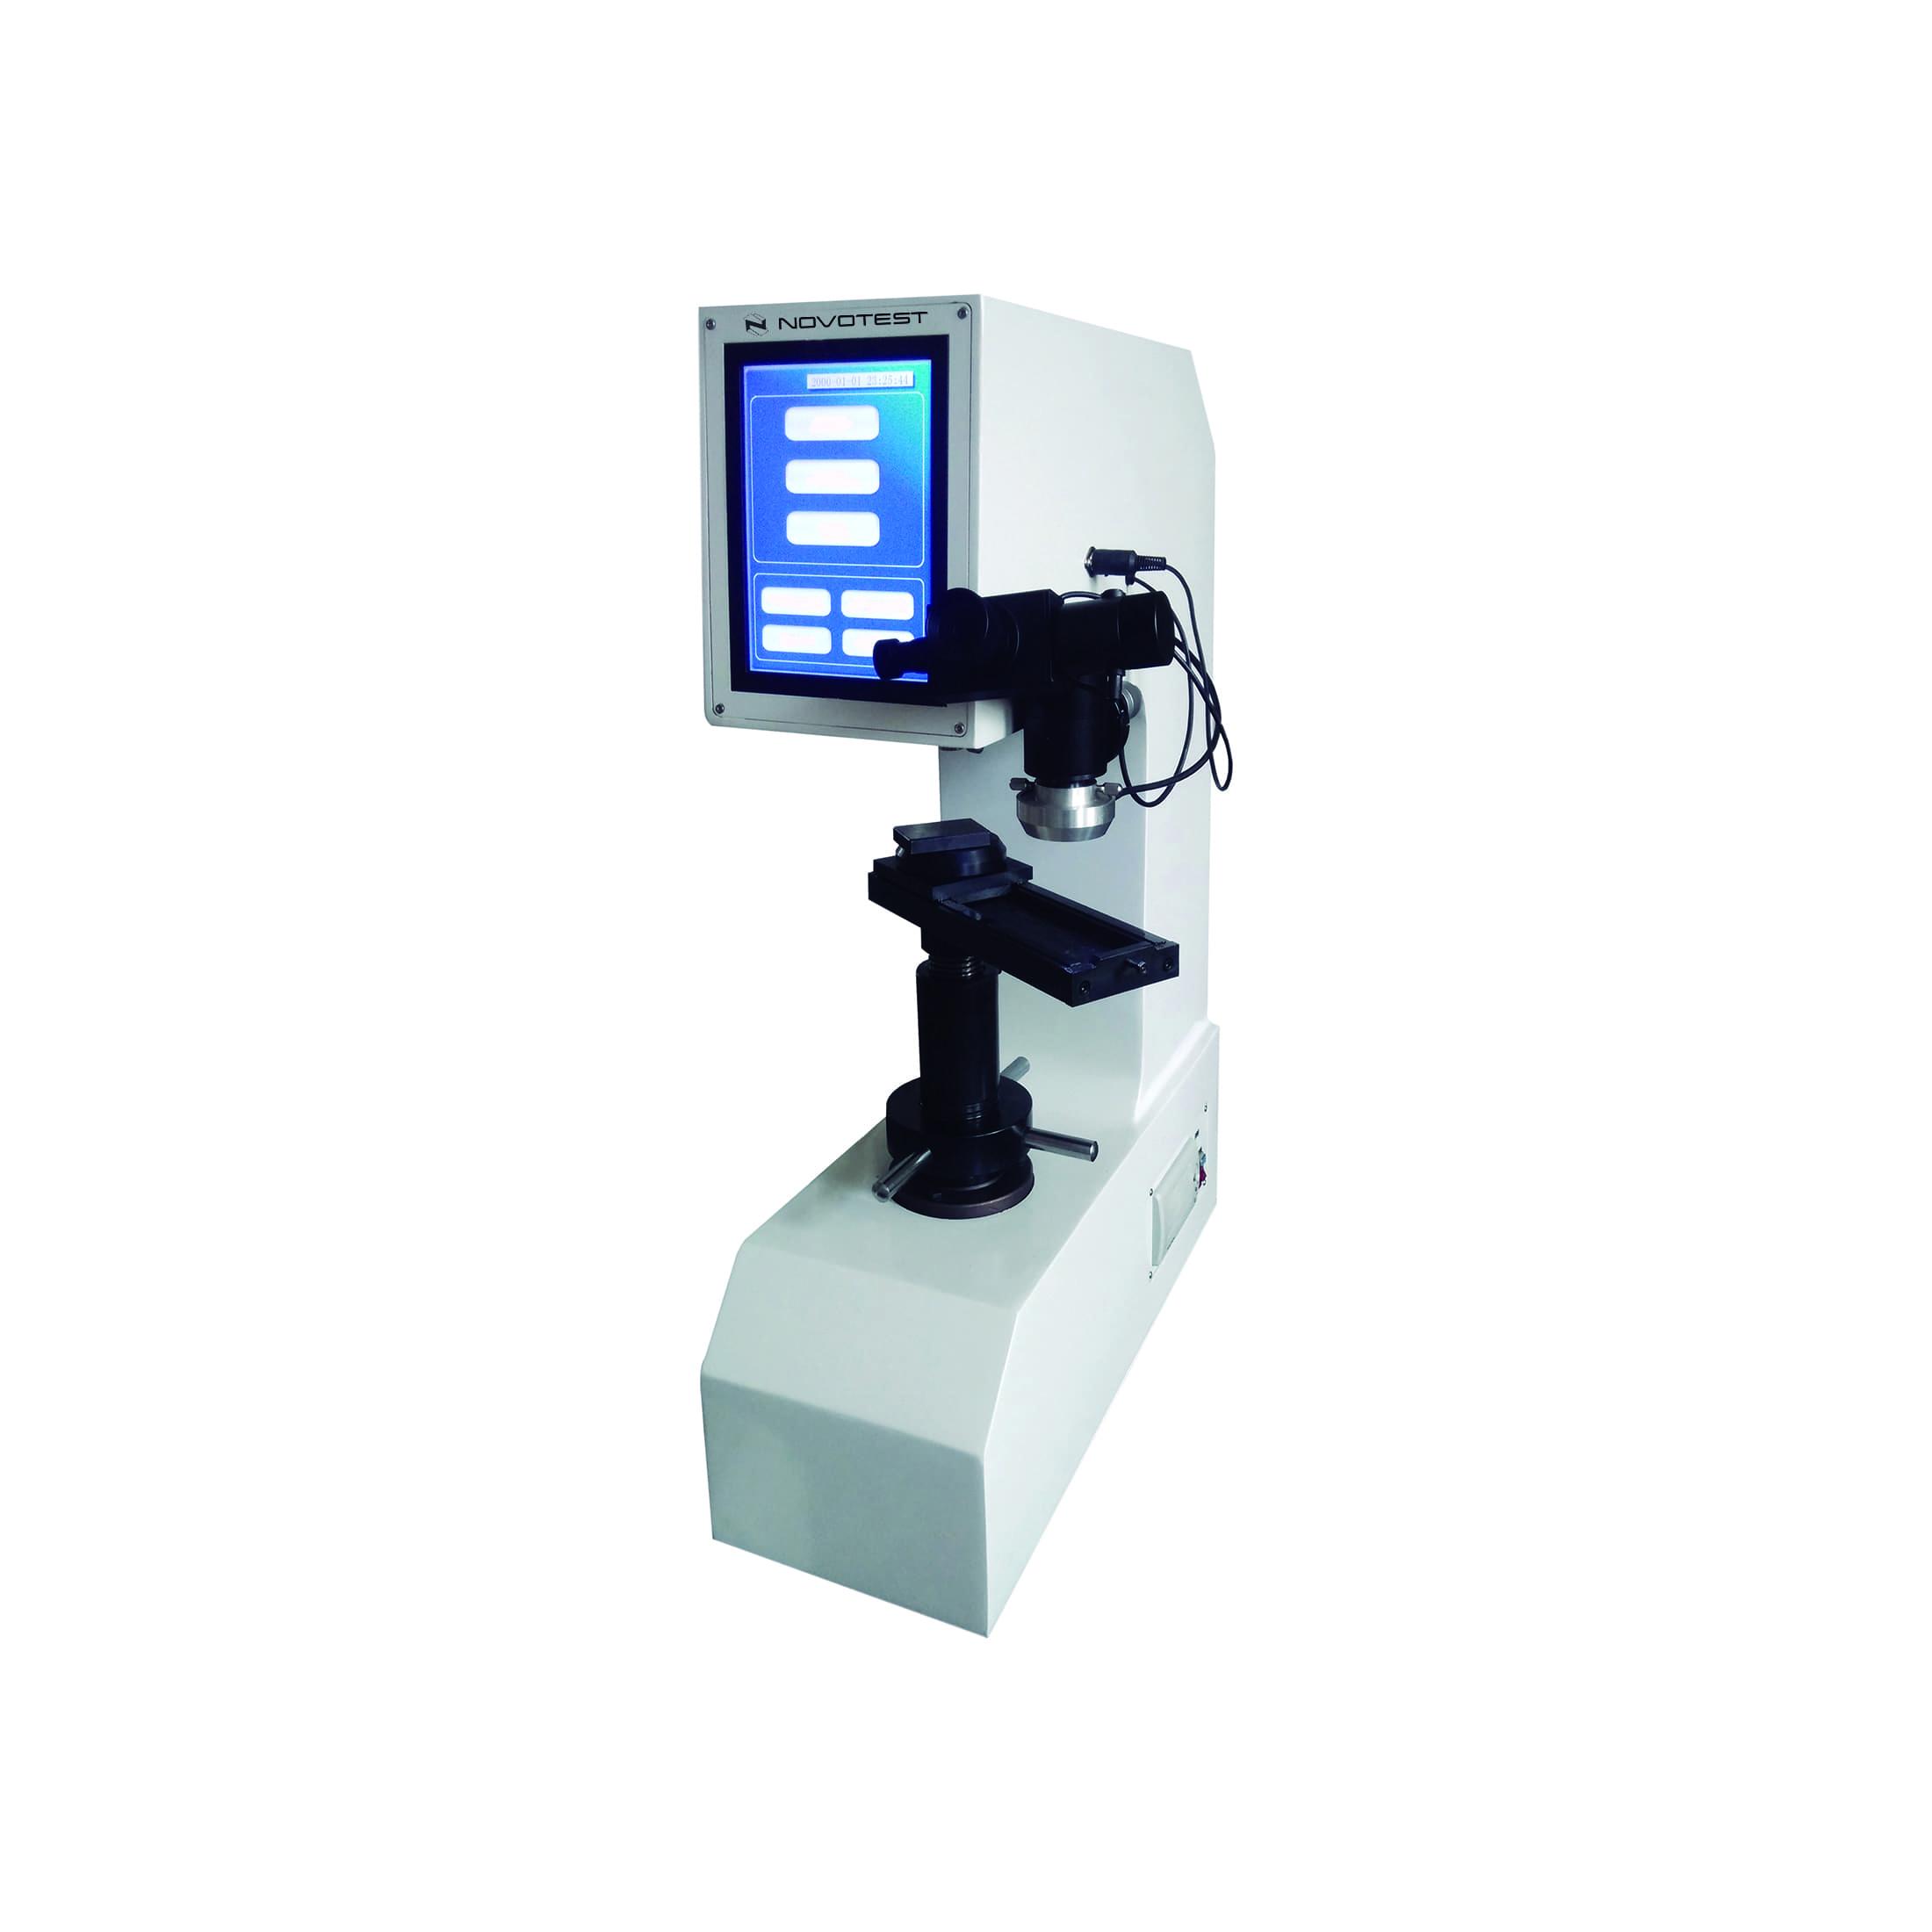 Digital Brinell, Rockwell, Vickers Hardness Tester NOVOTEST TB-BRV-D